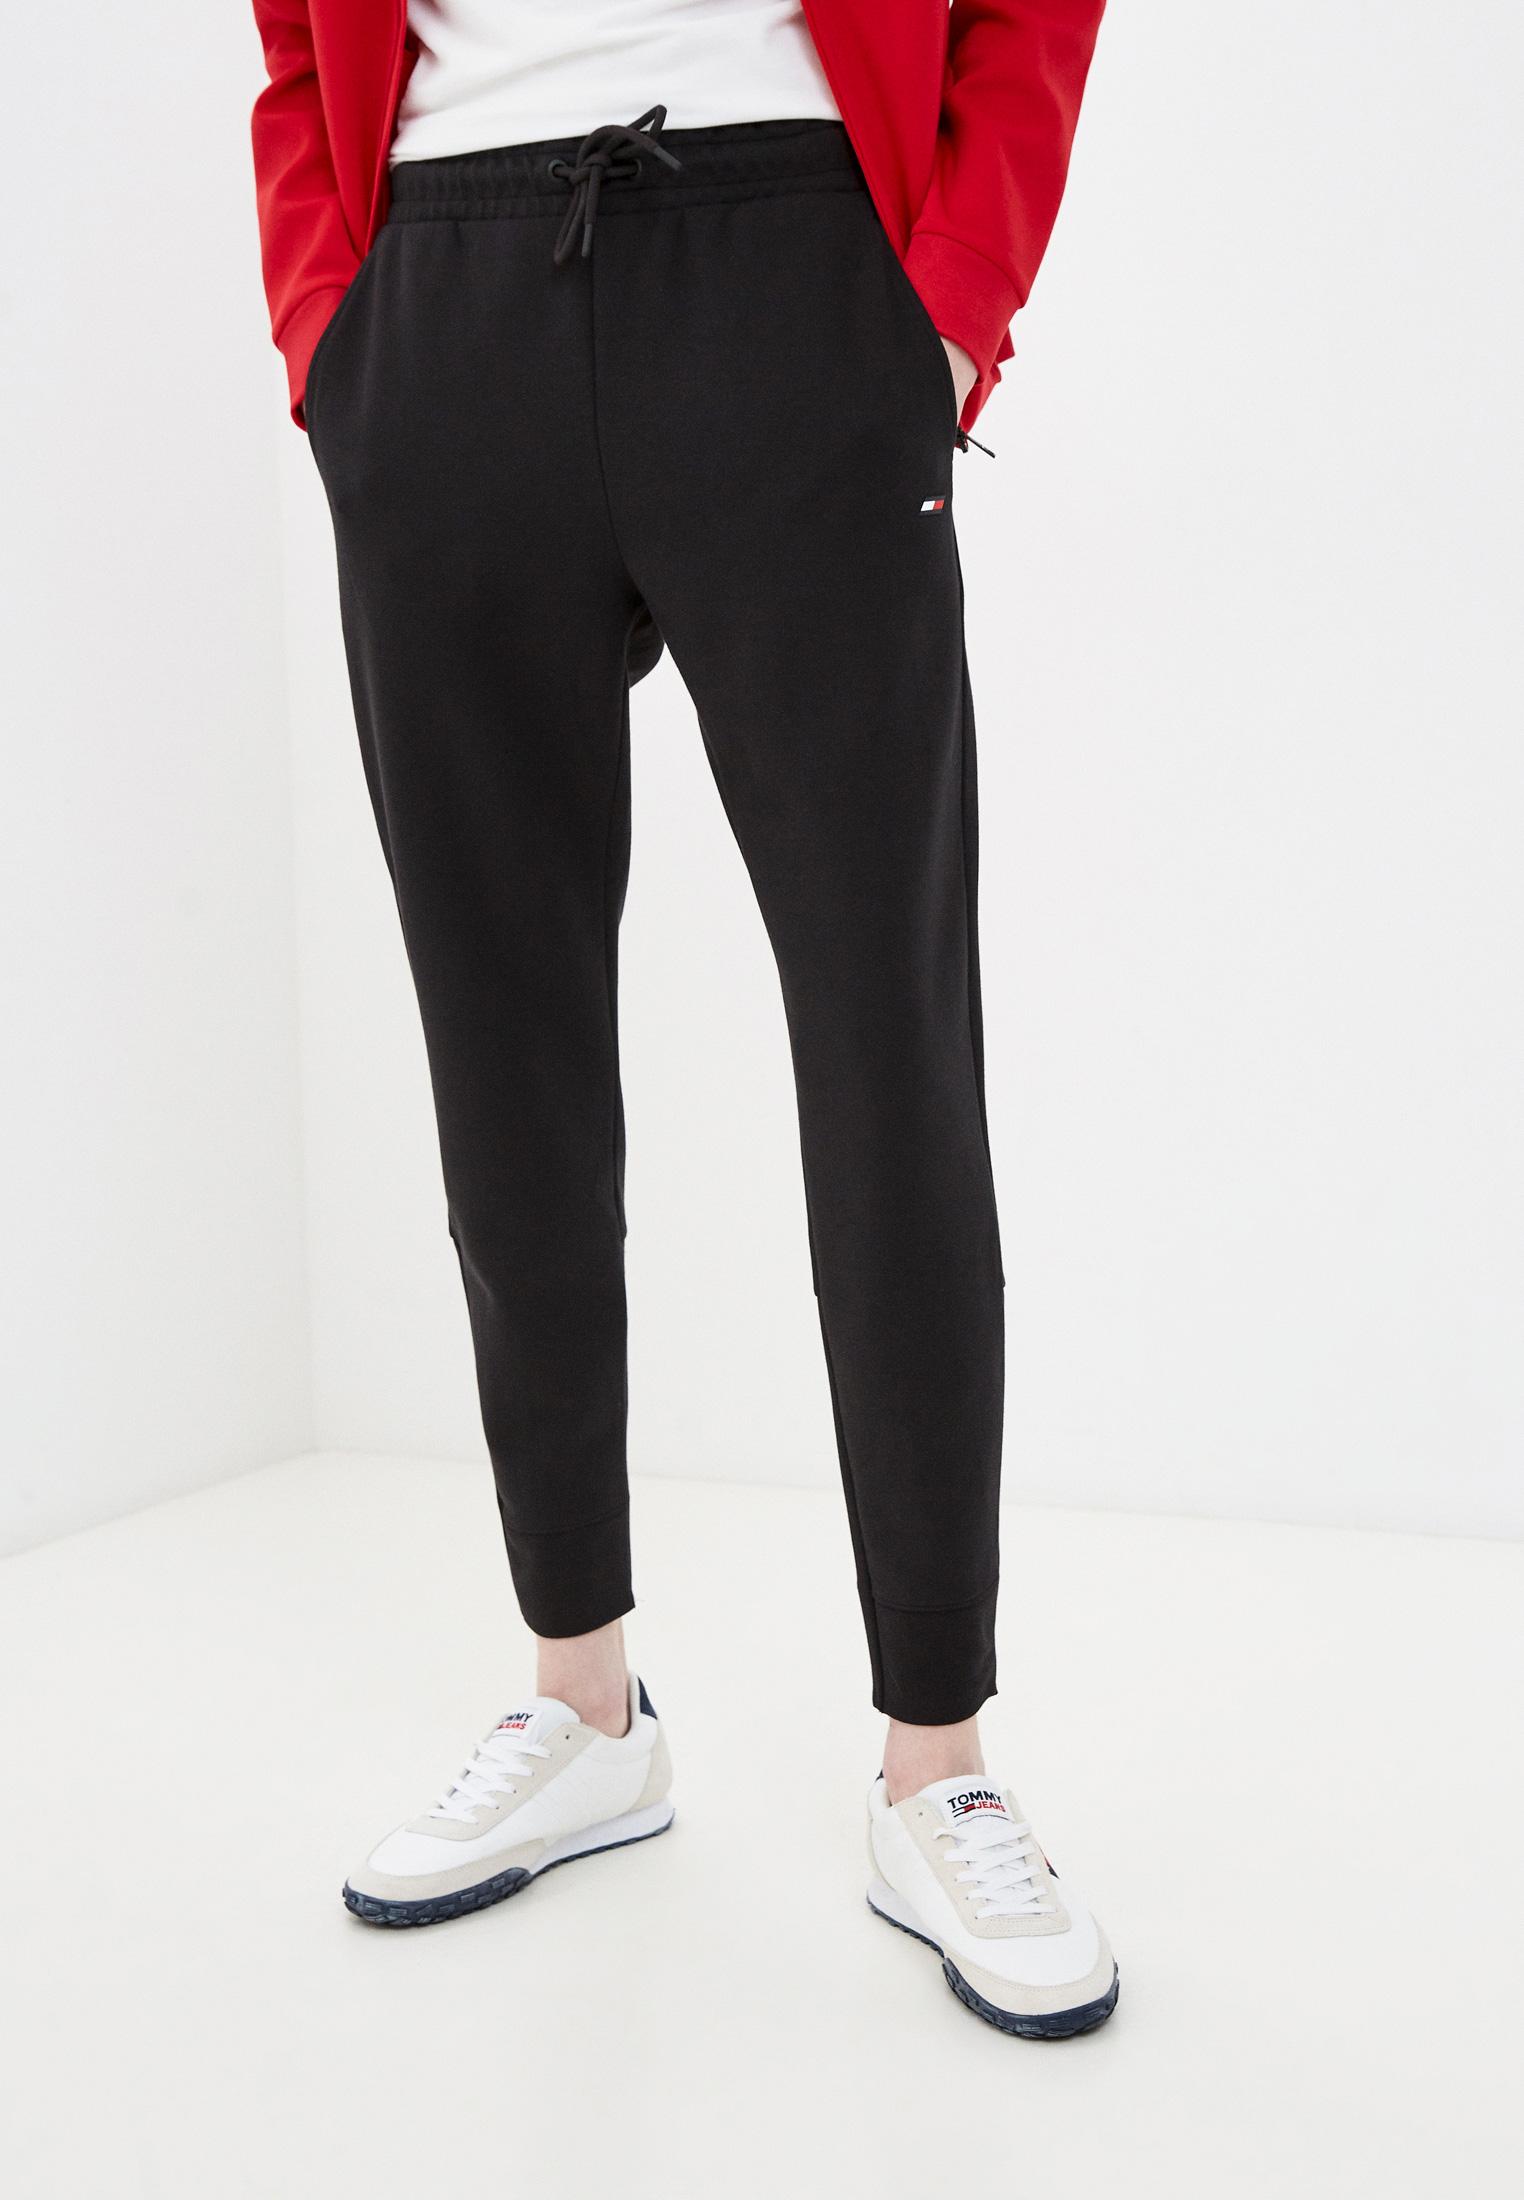 Мужские спортивные брюки Tommy Hilfiger (Томми Хилфигер) MW0MW17271